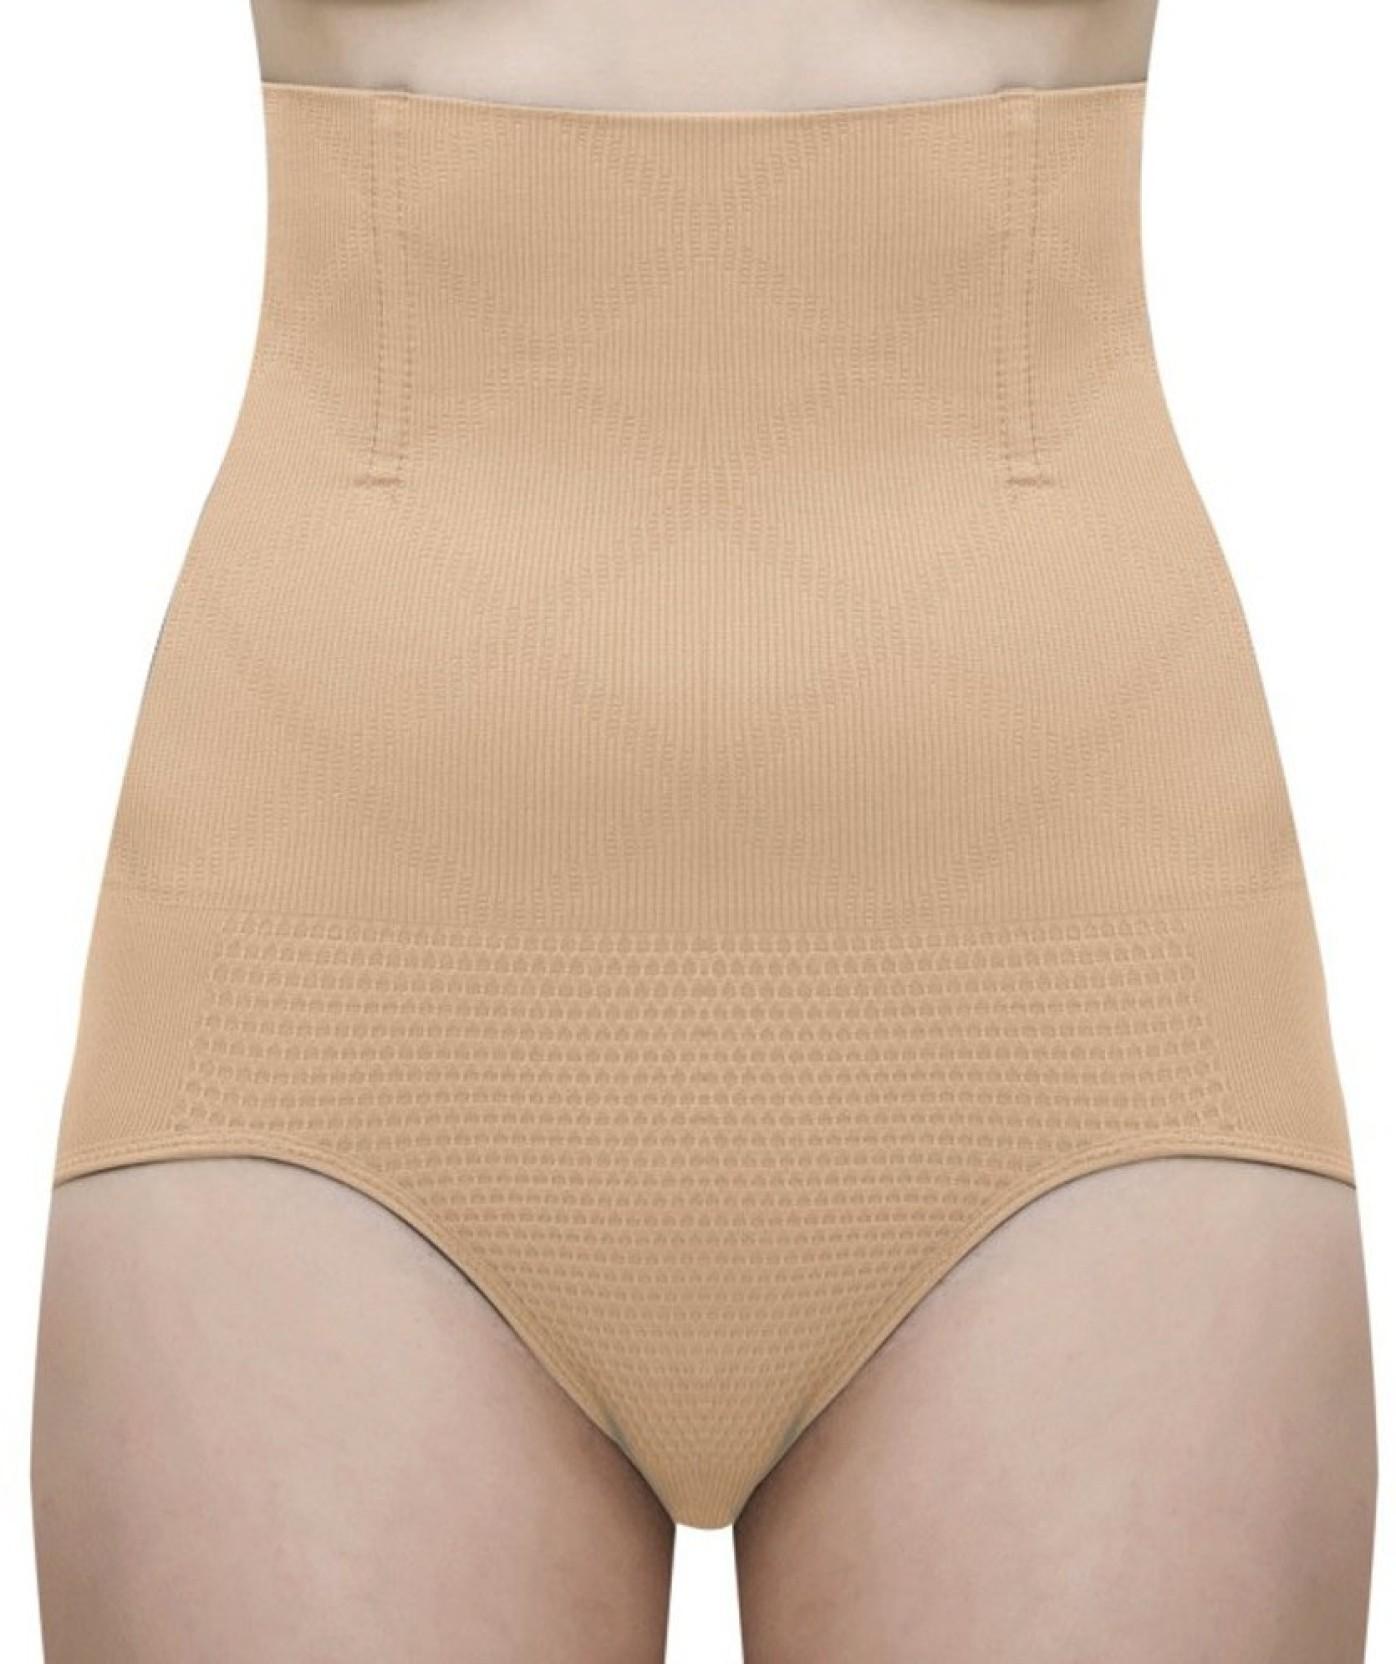 d67d440cde542 Wetex Premium Women s Shapewear - Buy Beige Wetex Premium Women s ...